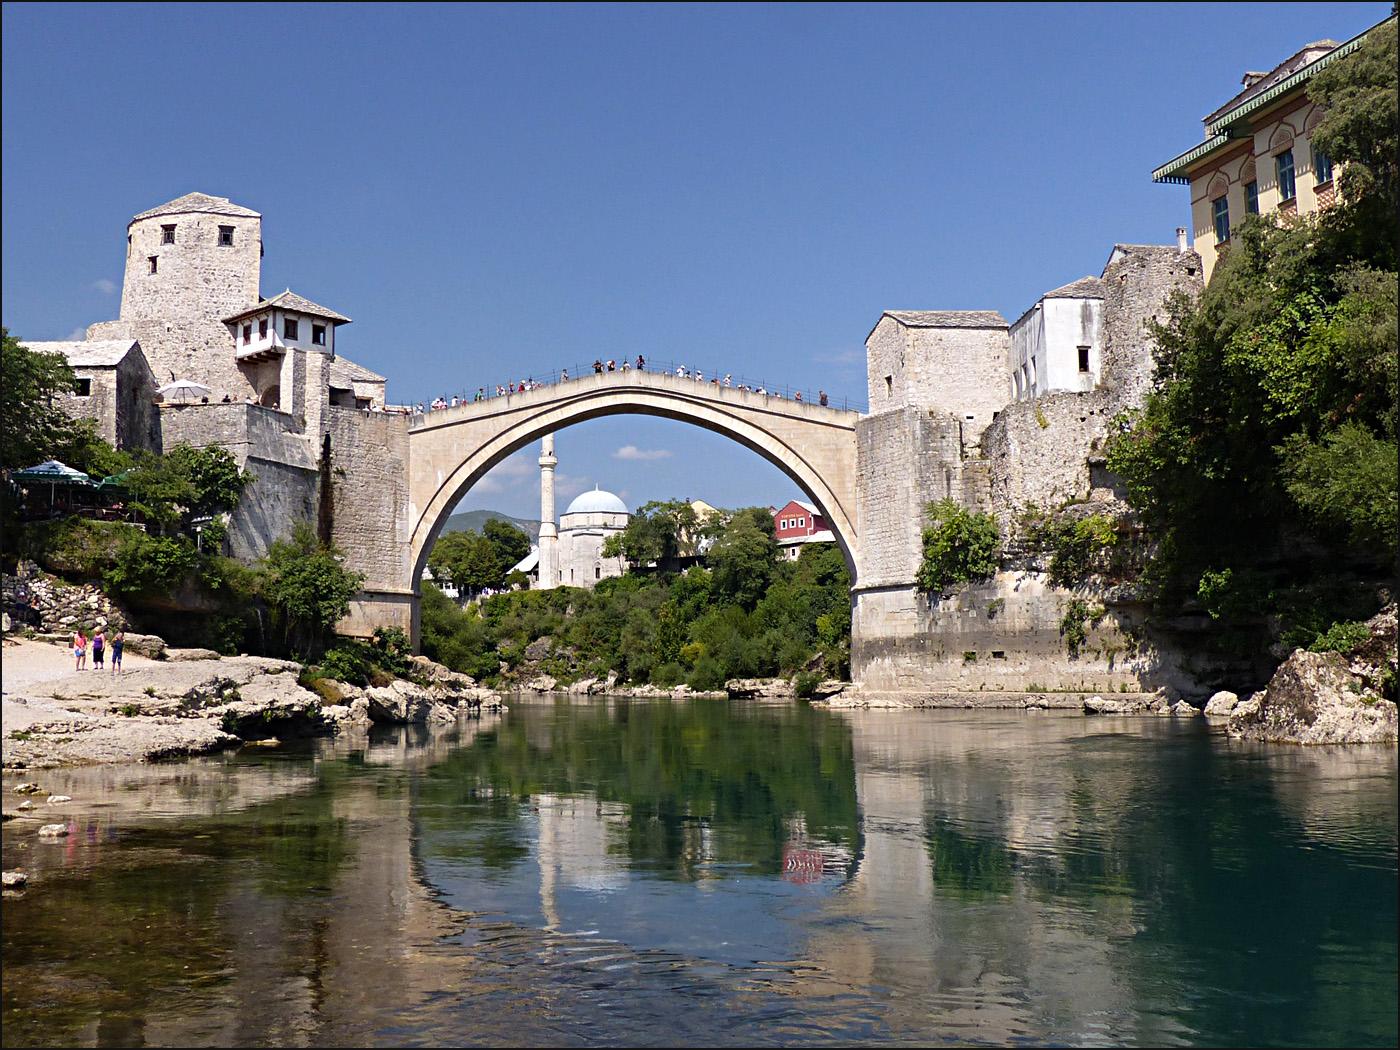 'Mostar rebuilt' by Austin Thorp